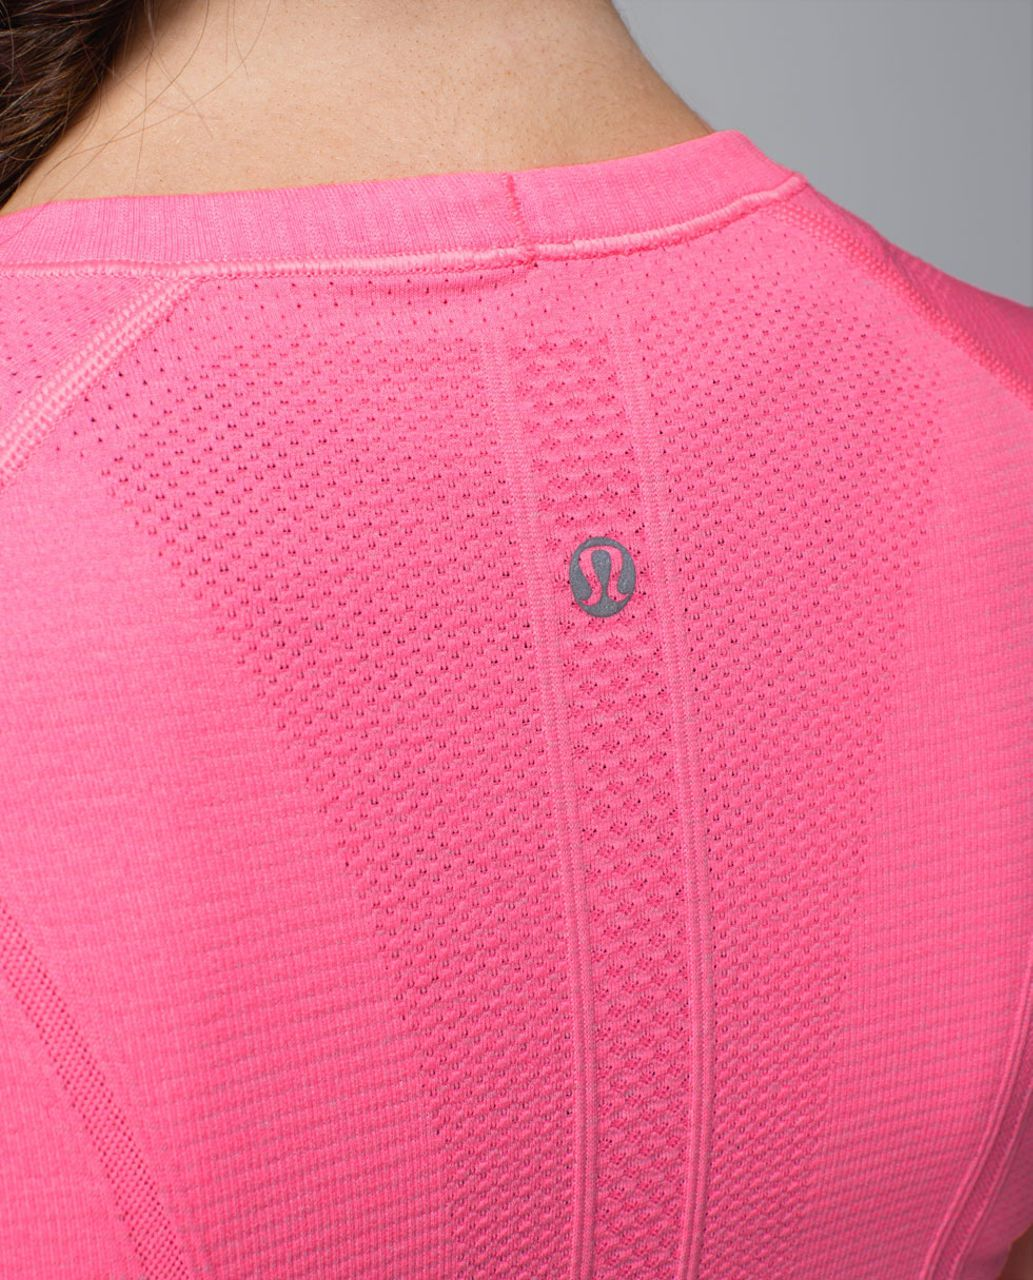 Lululemon Run:  Swiftly Tech Short Sleeve - Heathered Zing Pink Light